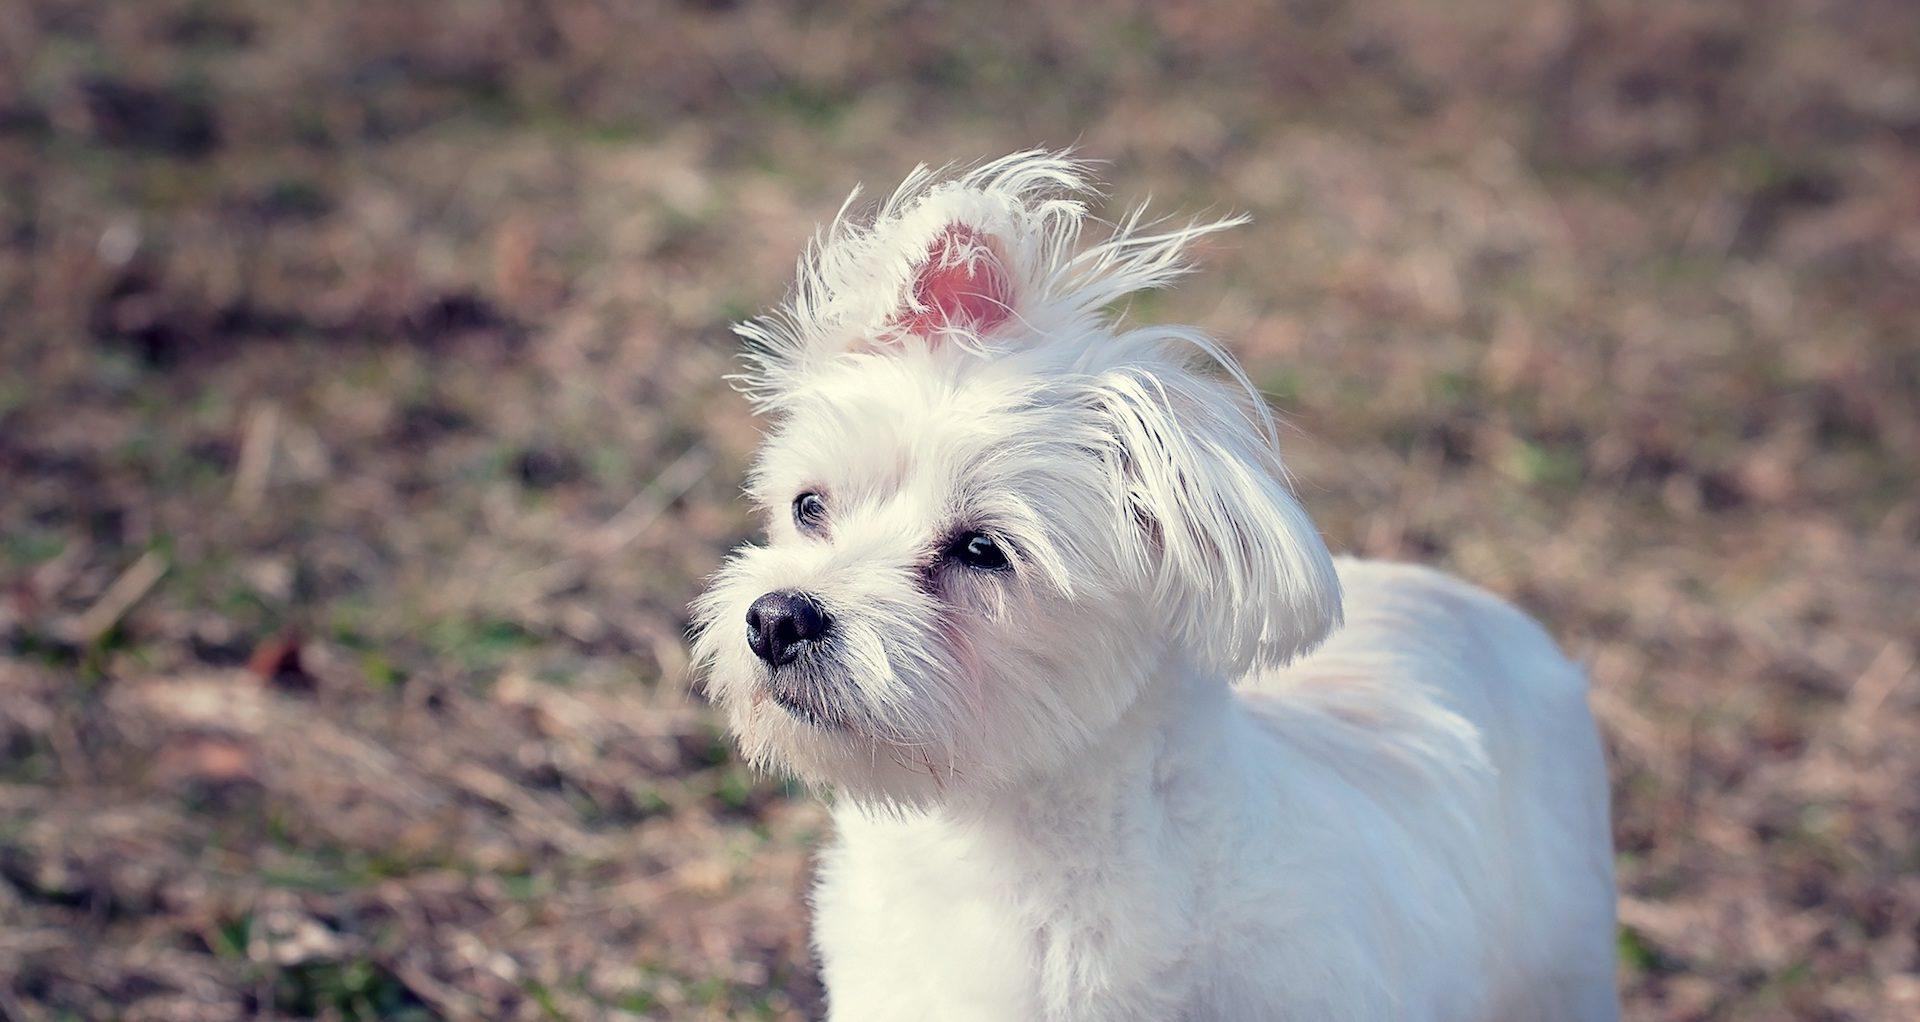 perro, mascota, bichón, maltes, amigo, compañía - Fondos de Pantalla HD - professor-falken.com